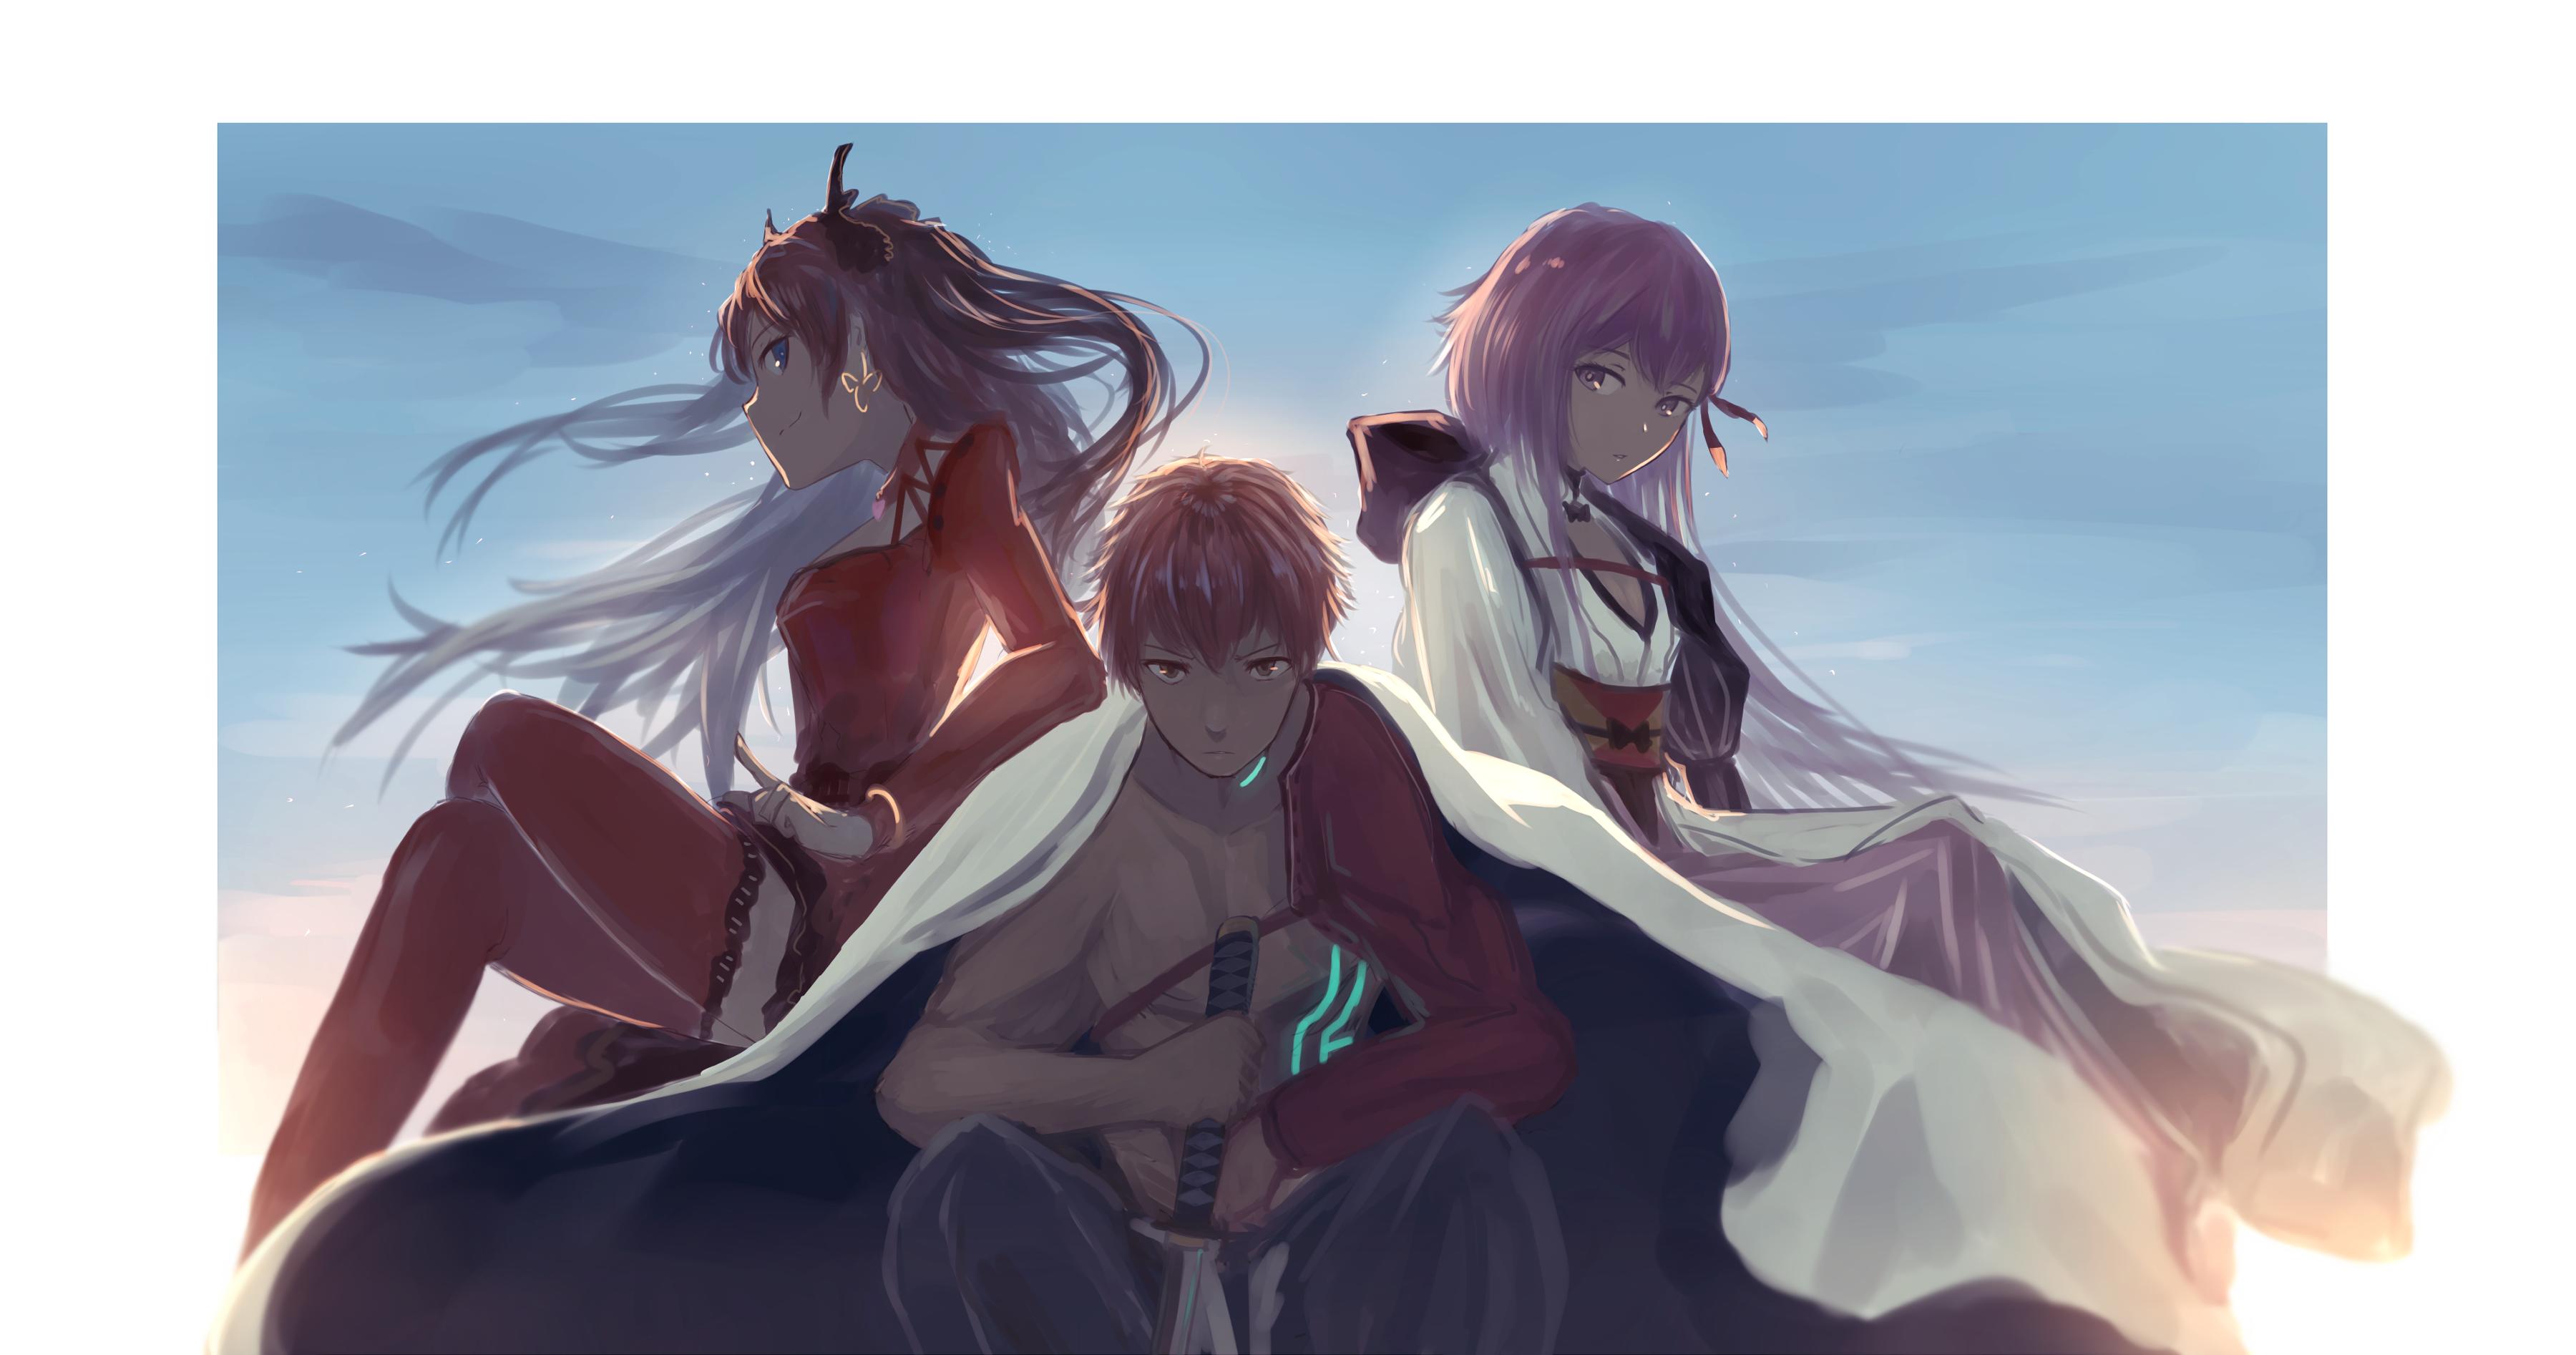 Shirou Emiya Rin Tohsaka Sakura Matou Fate Grand Order